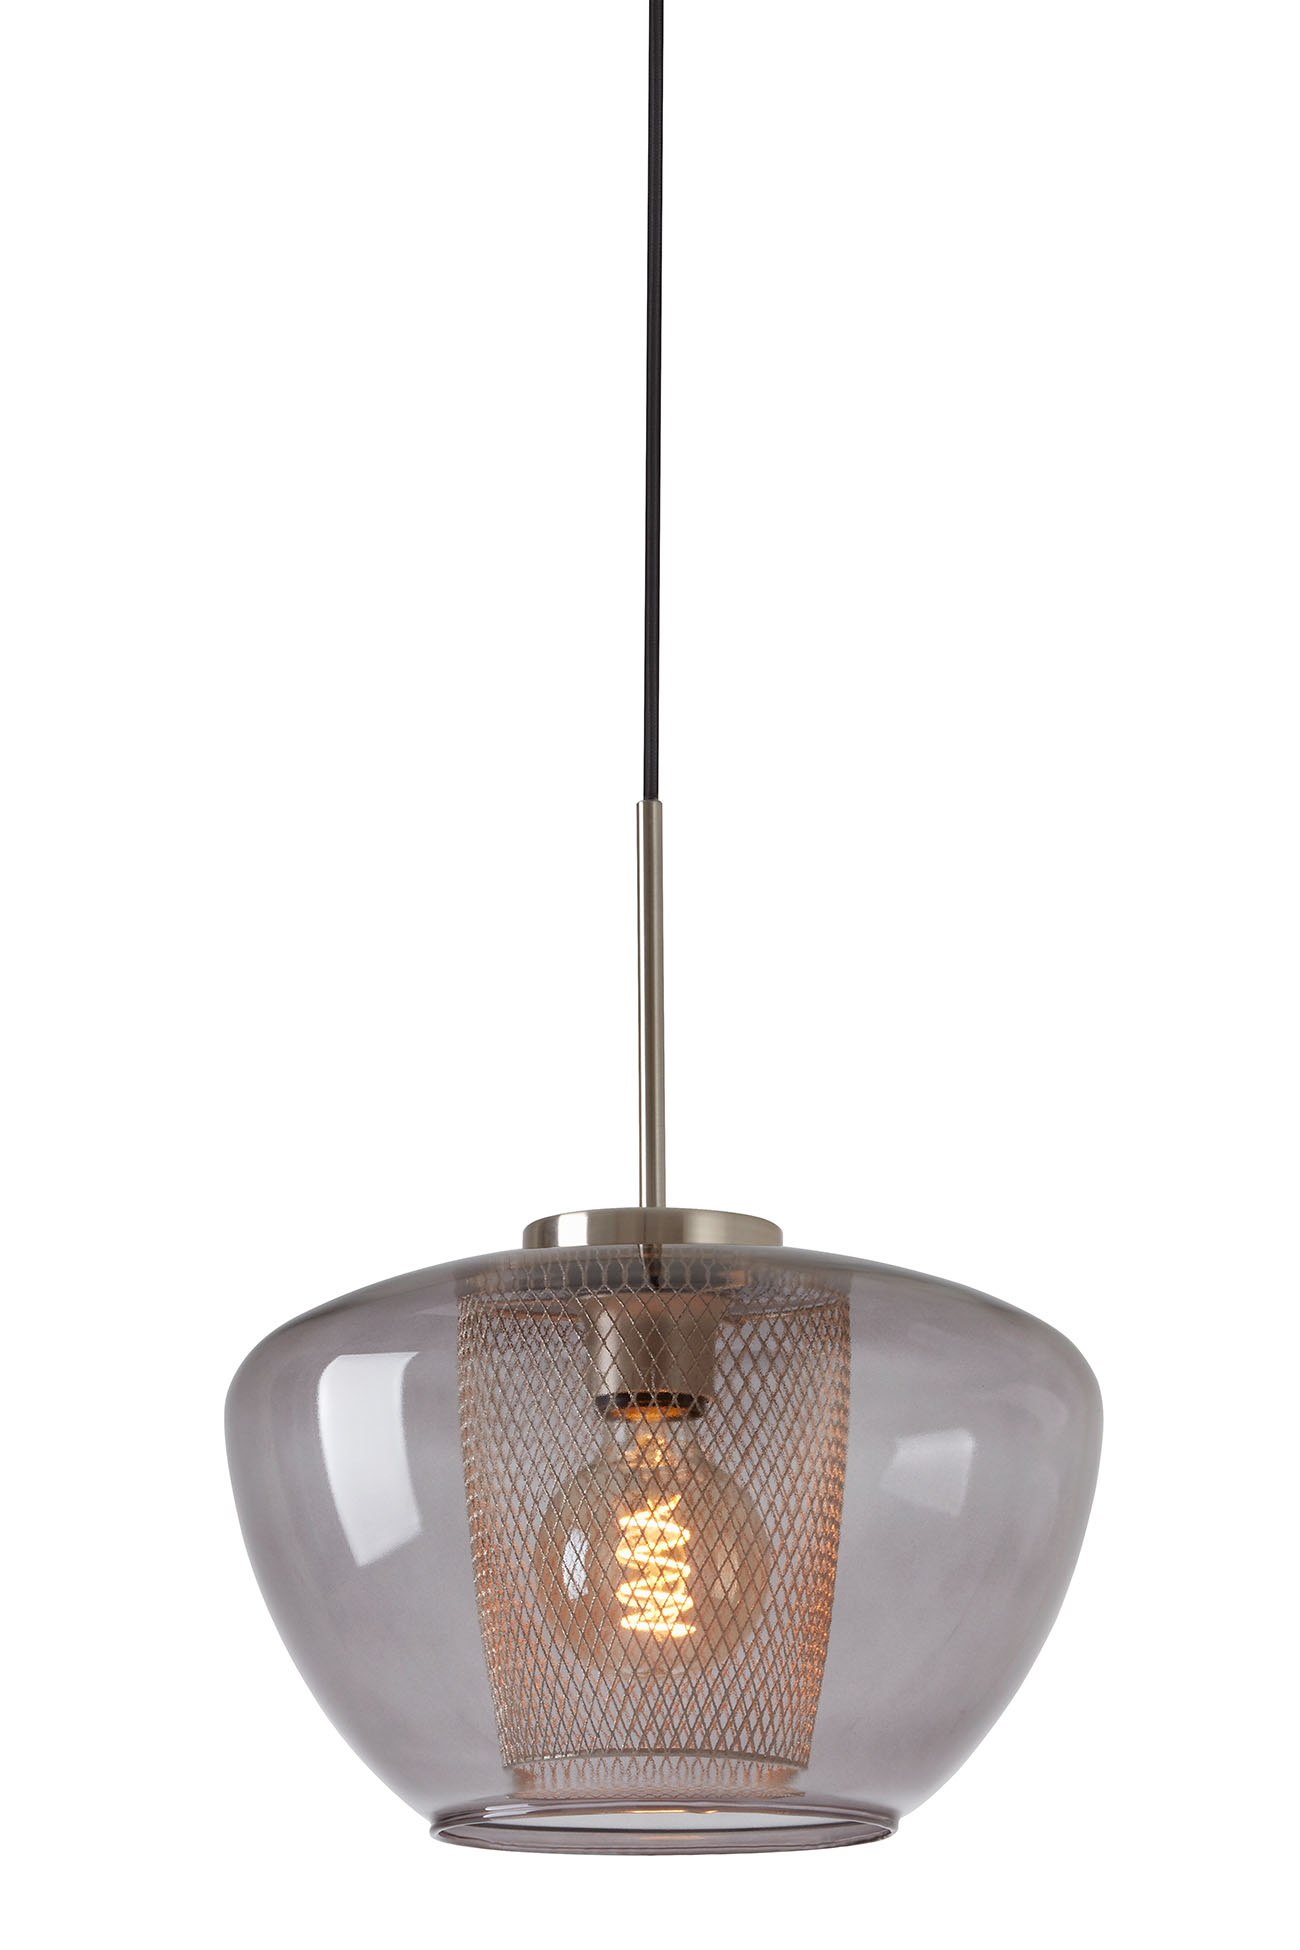 LED Pendelleuchte, Ø 30 cm, max. 40 W, Matt-Nickel